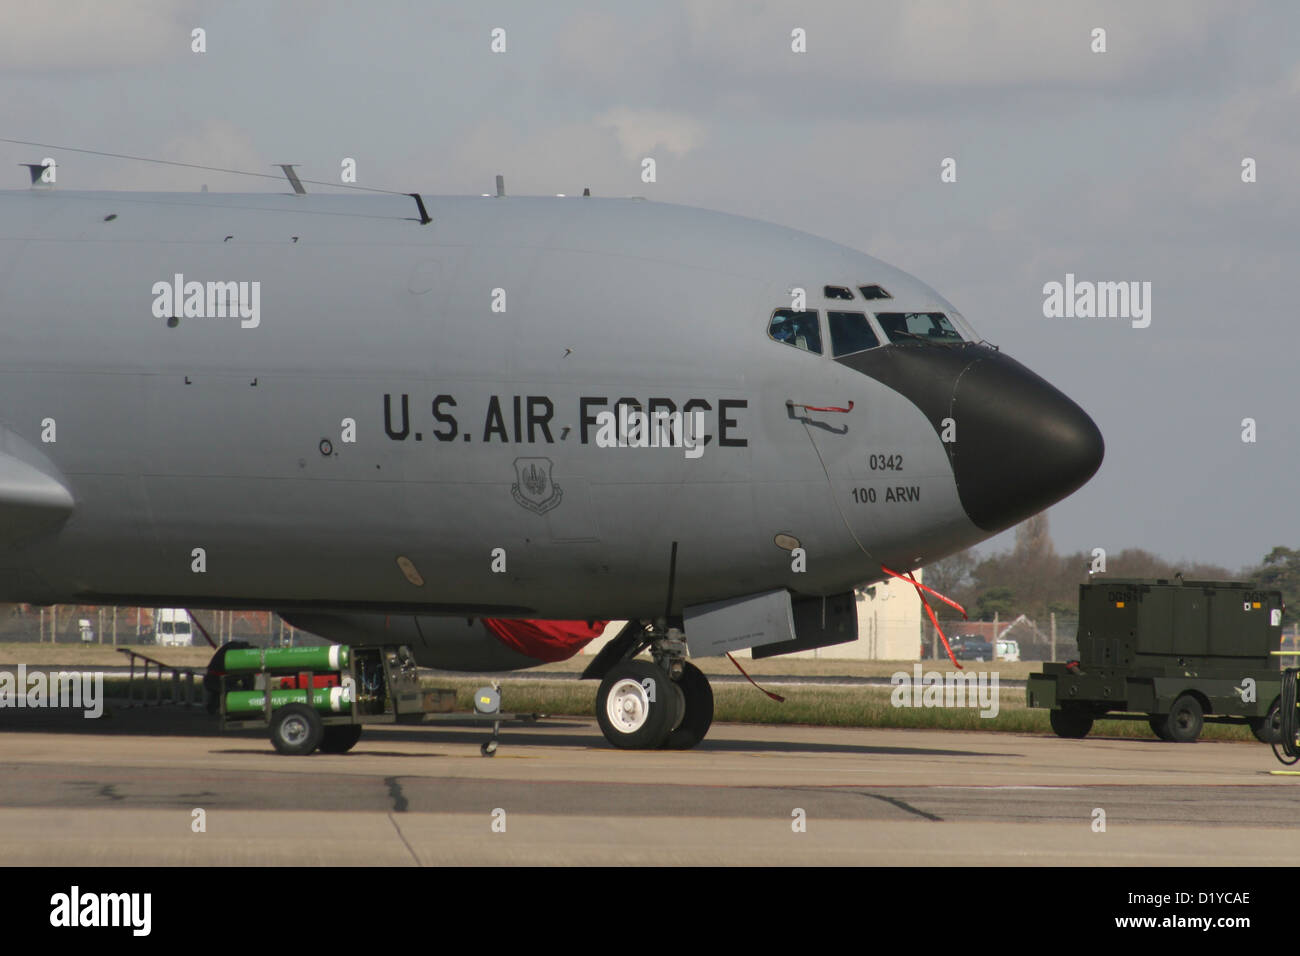 USAF US AIR FORCE. USA - Stock Image